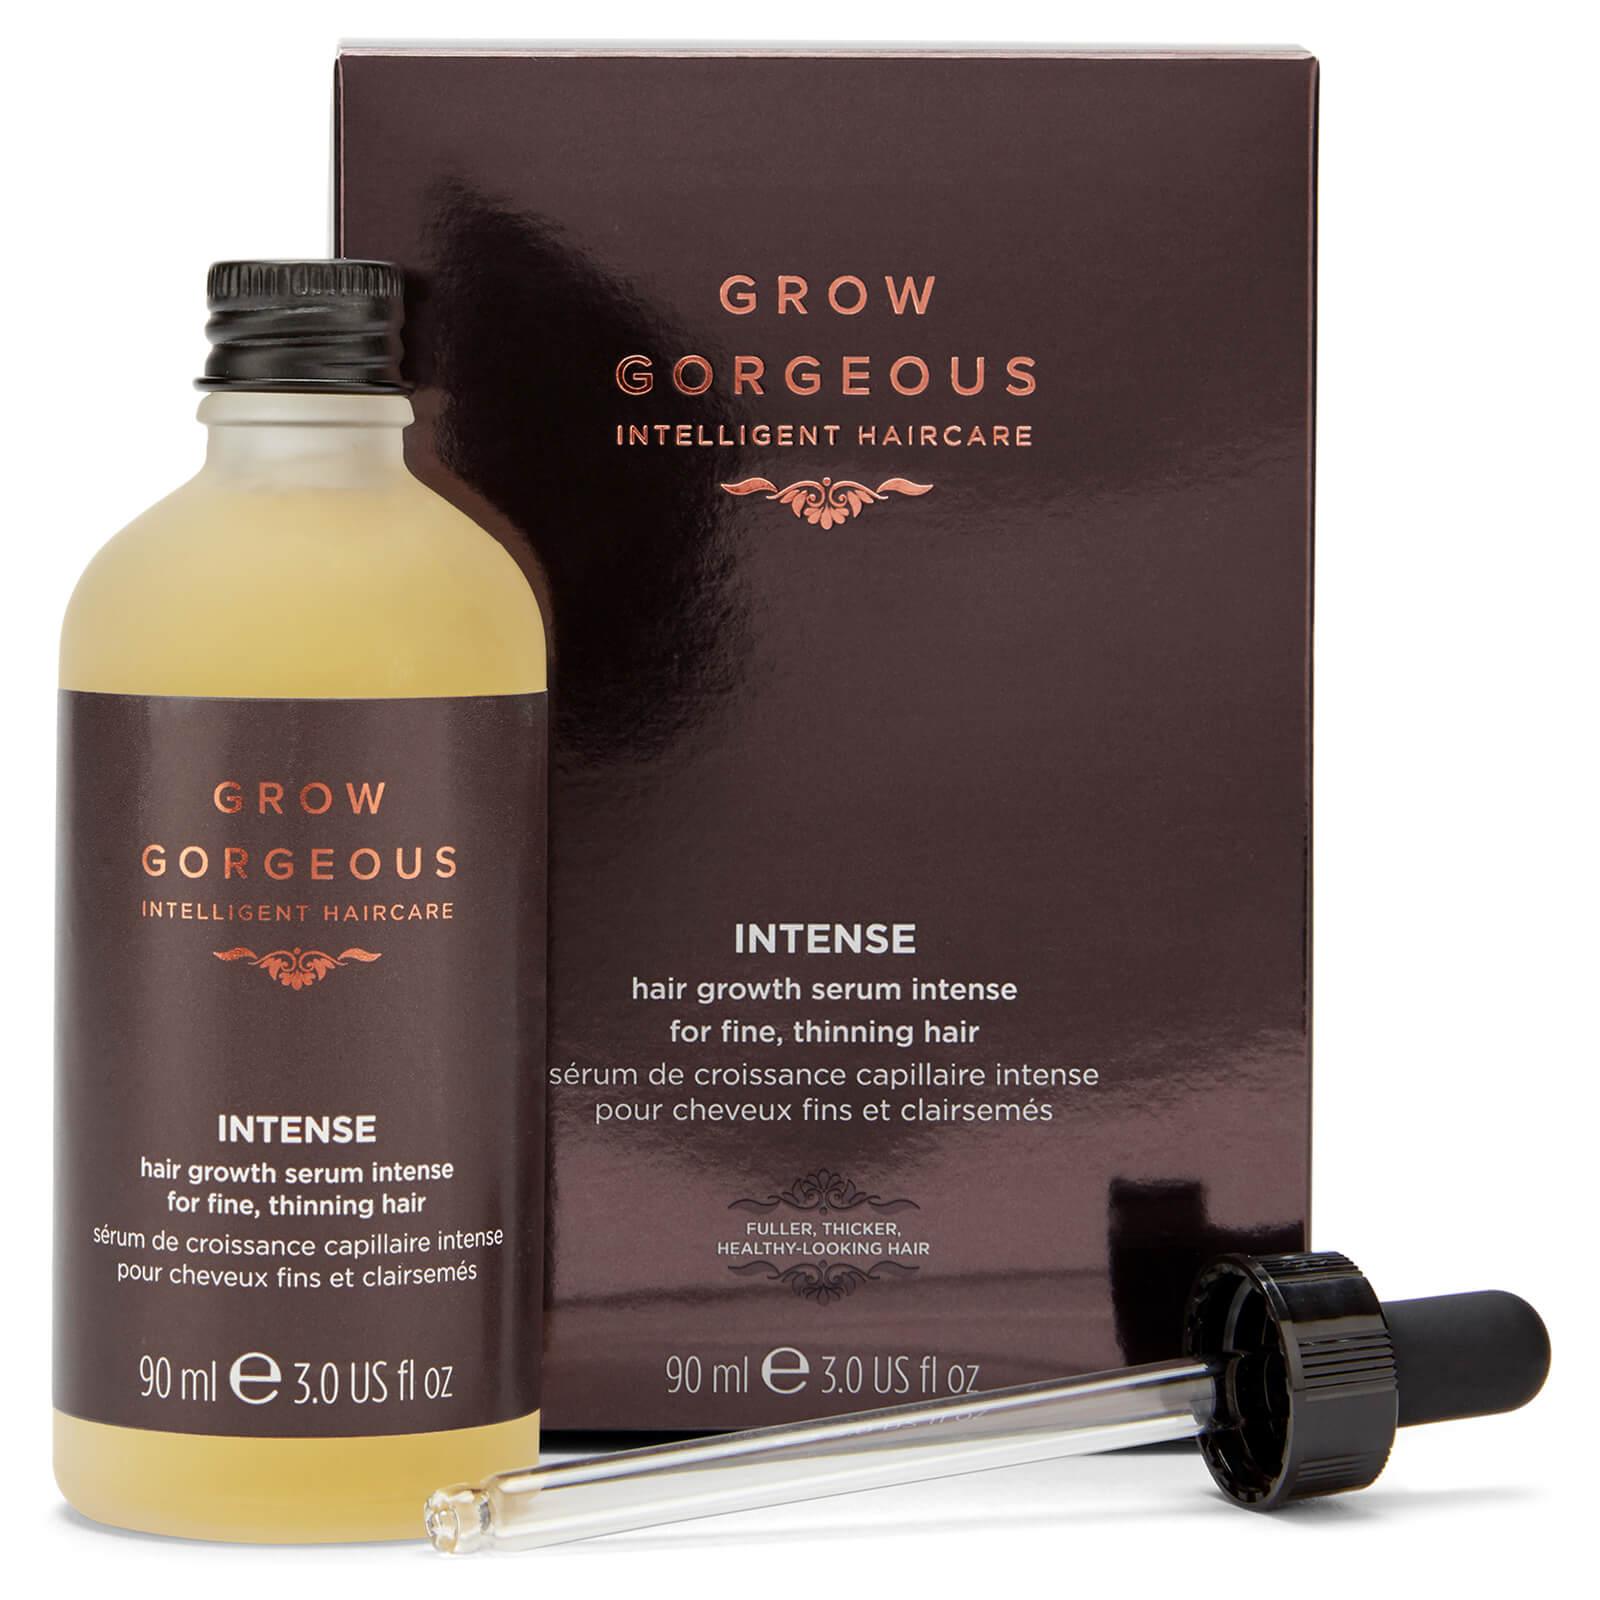 Grow Gorgeous Growth Serum Intense 90ml